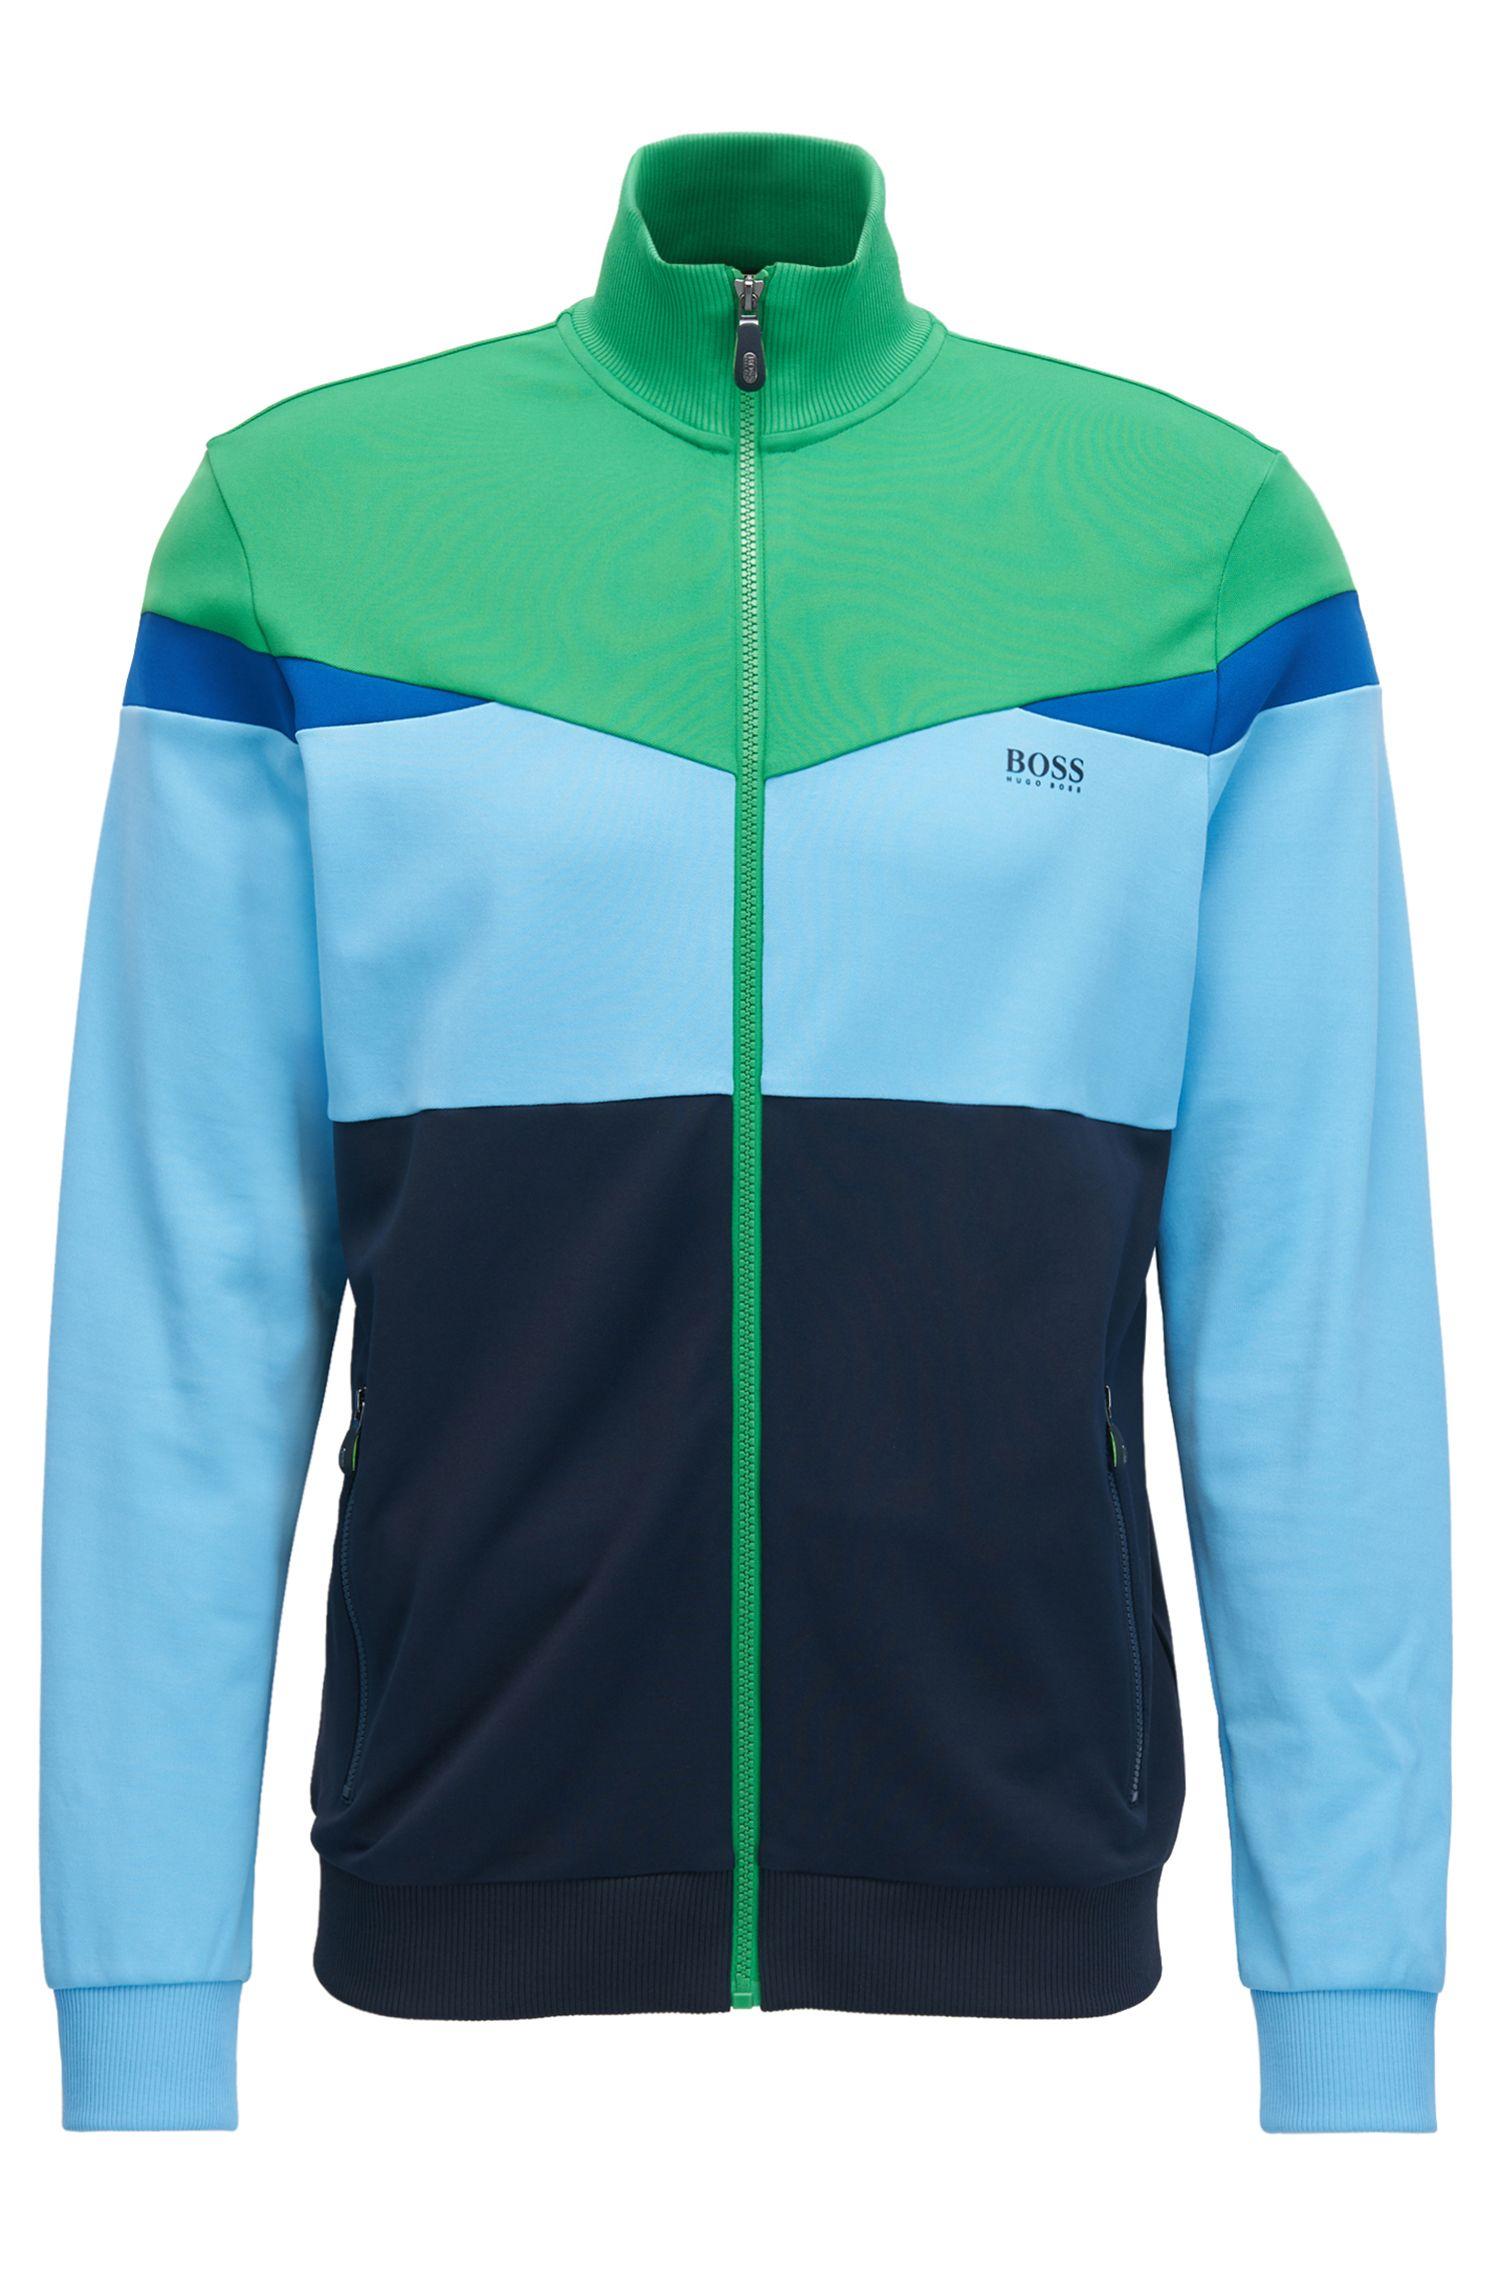 Regular-Fit Jacke aus Piqué in Colour-Block-Optik